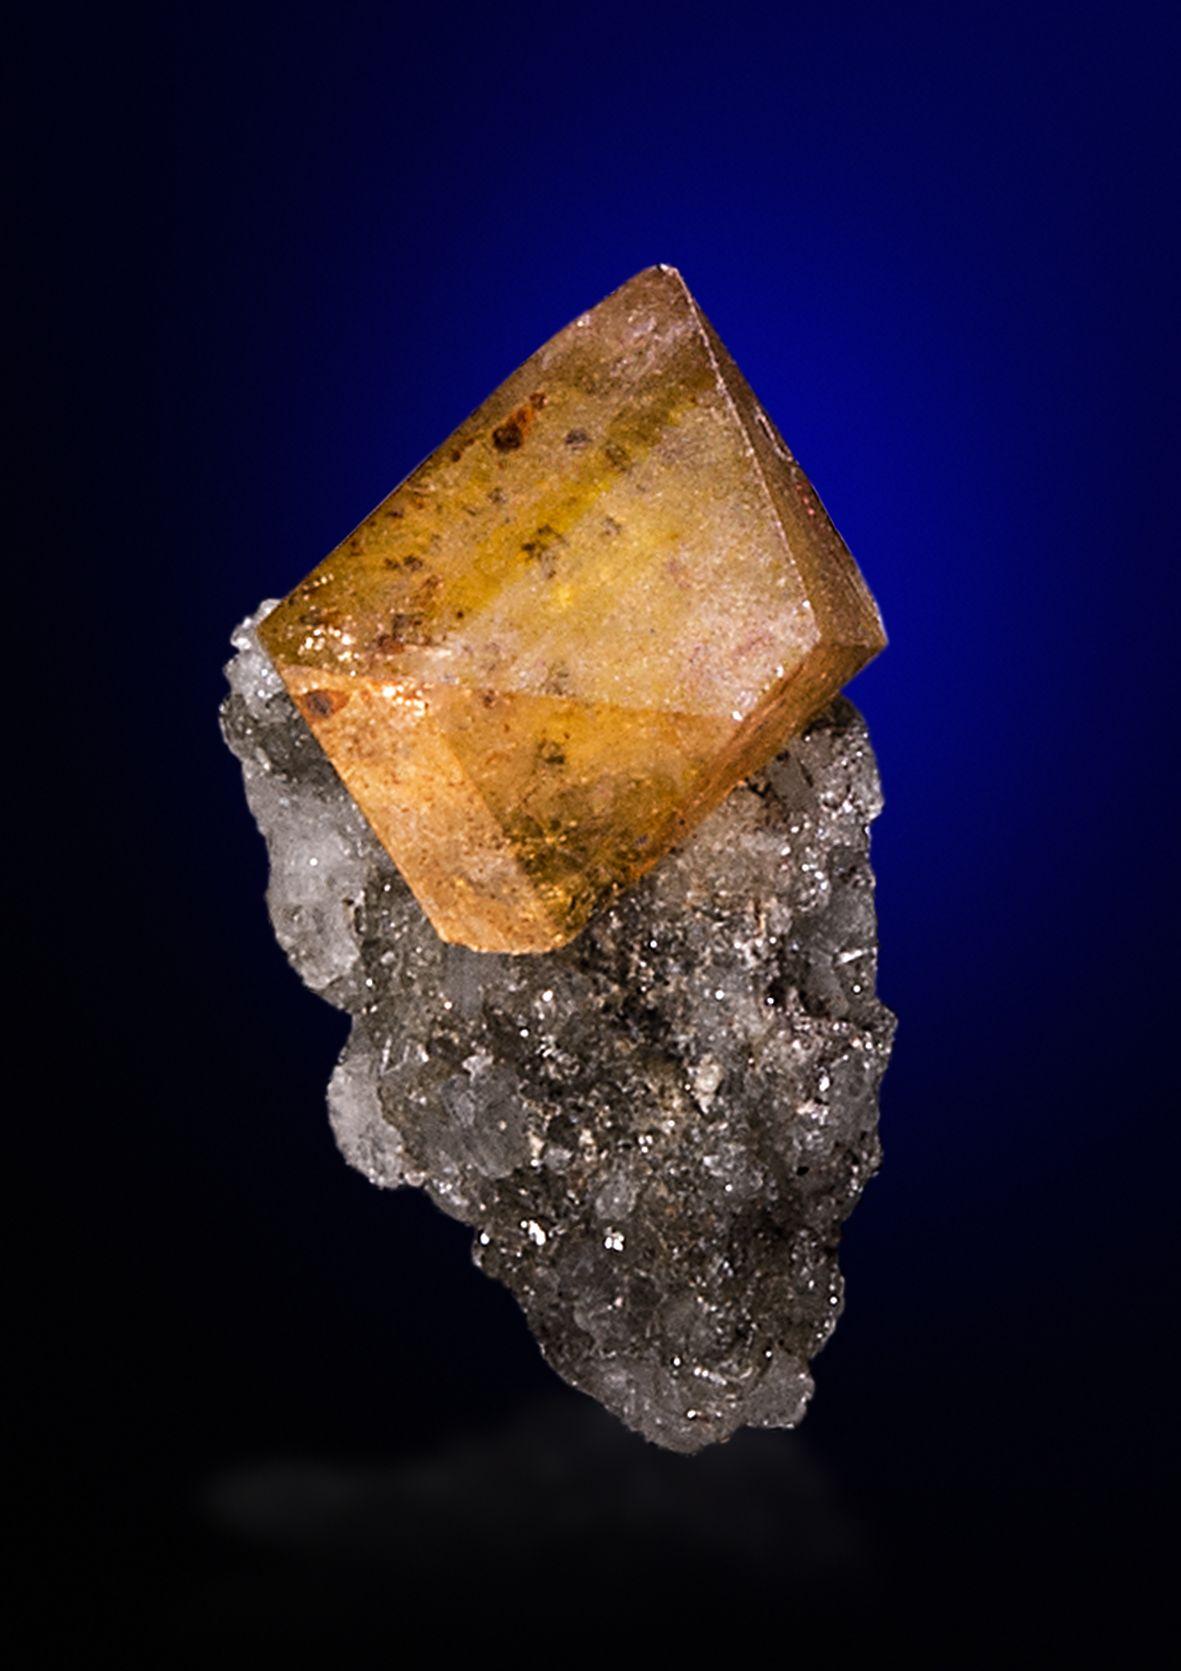 Kainosite Hopffeldgraben, Obersulzbachtal, Pinzgau, Salzburg, Austria Size: 0.8 x 0.5 x 0.5 cm